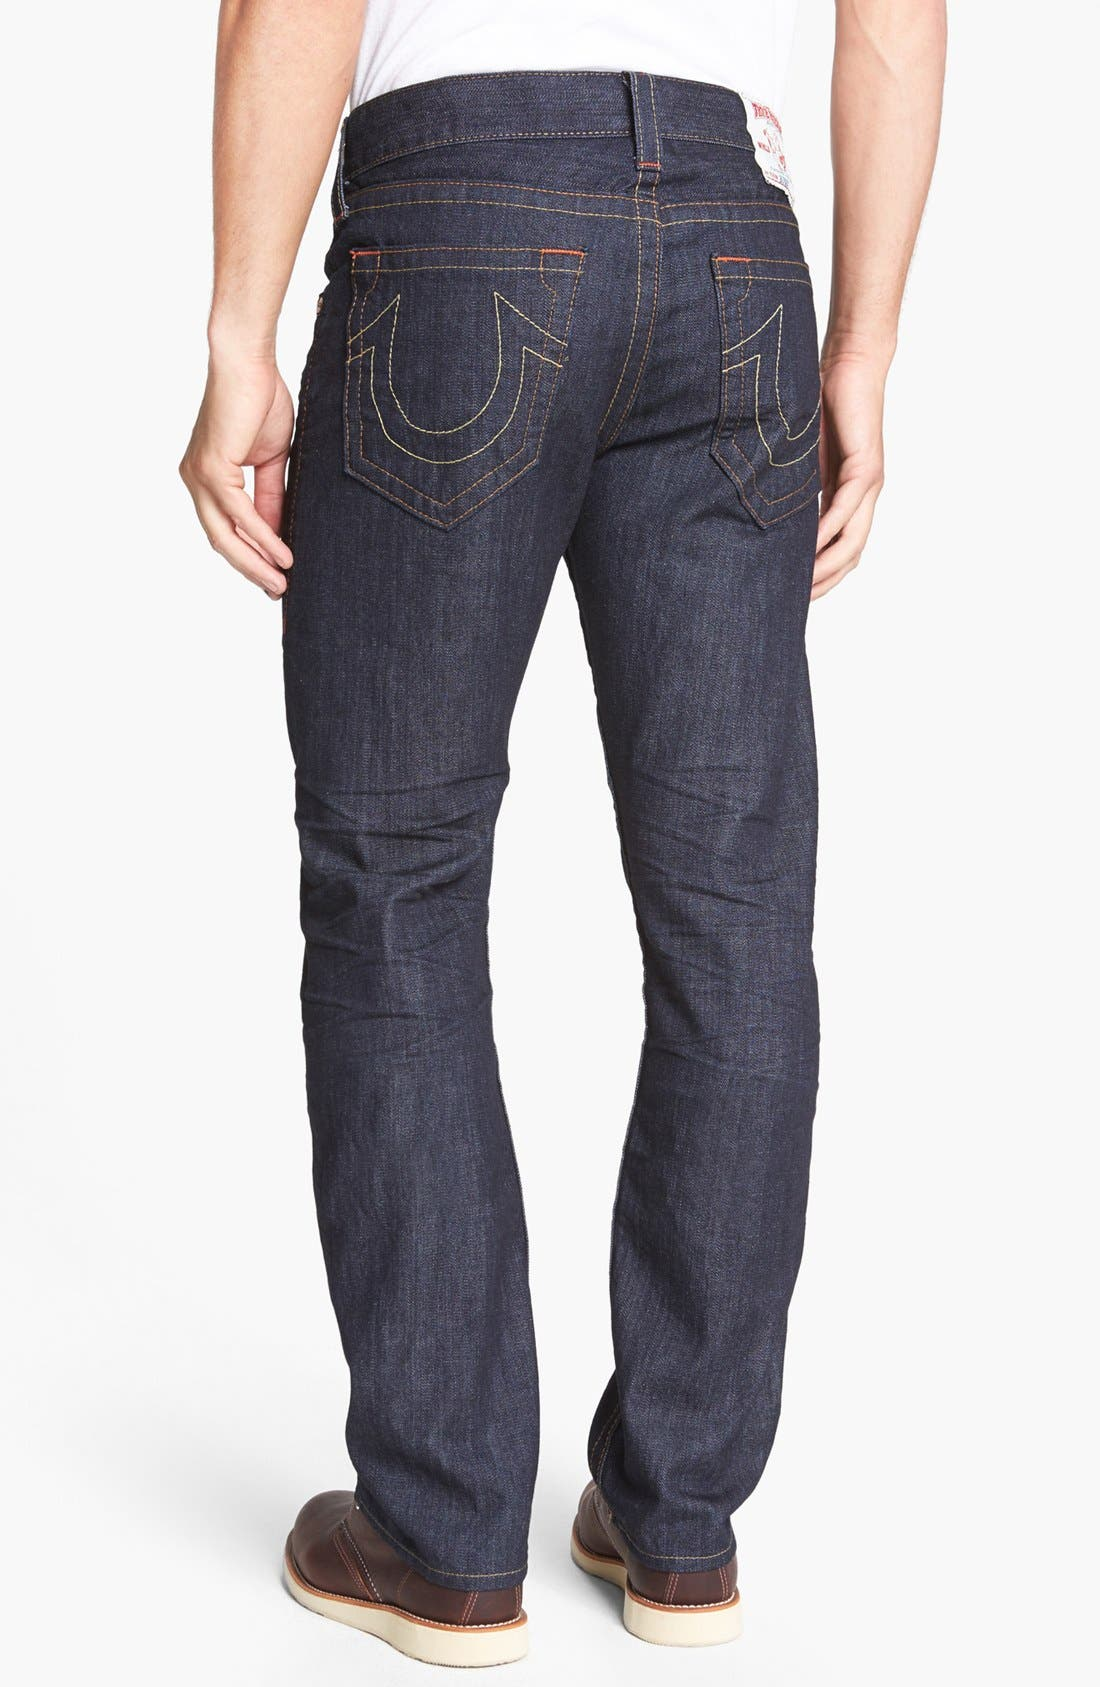 Alternate Image 1 Selected - True Religion Brand Jeans 'Bobby' Straight Leg Jeans (Bz Inglorious)